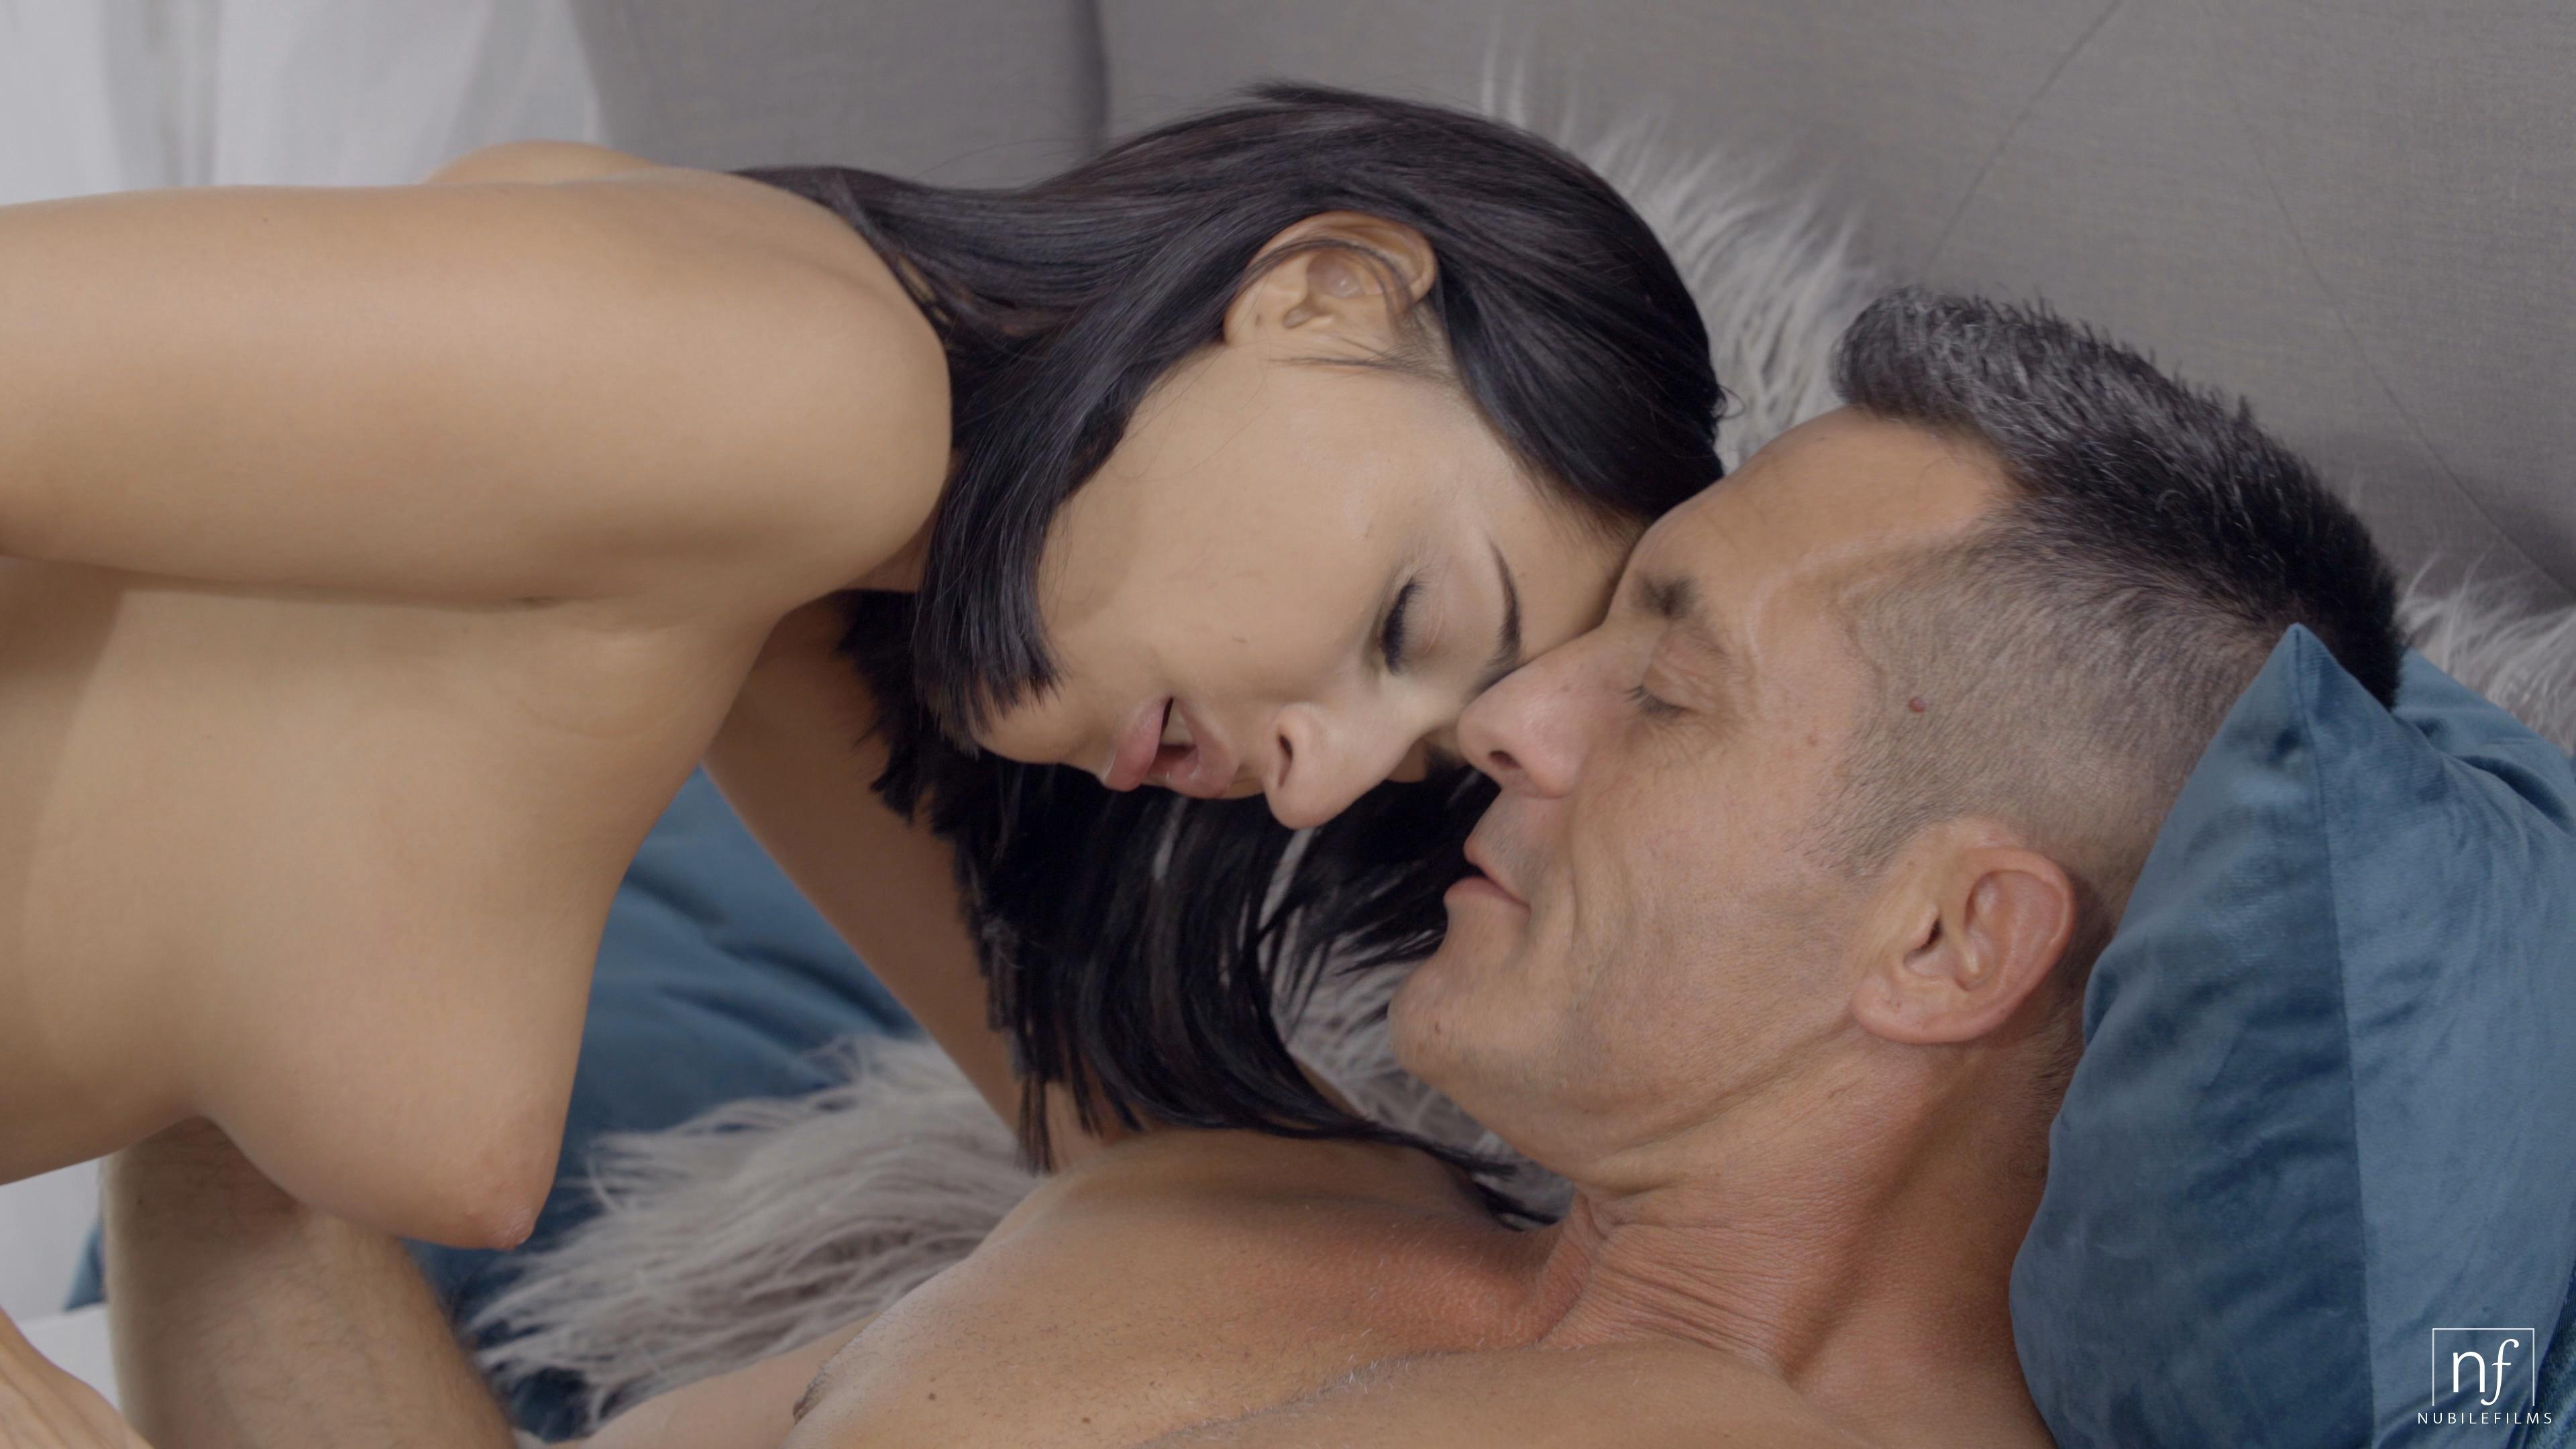 NubileFilms.com - Renato,Sarah Cute: Primal Passion - S37:E9